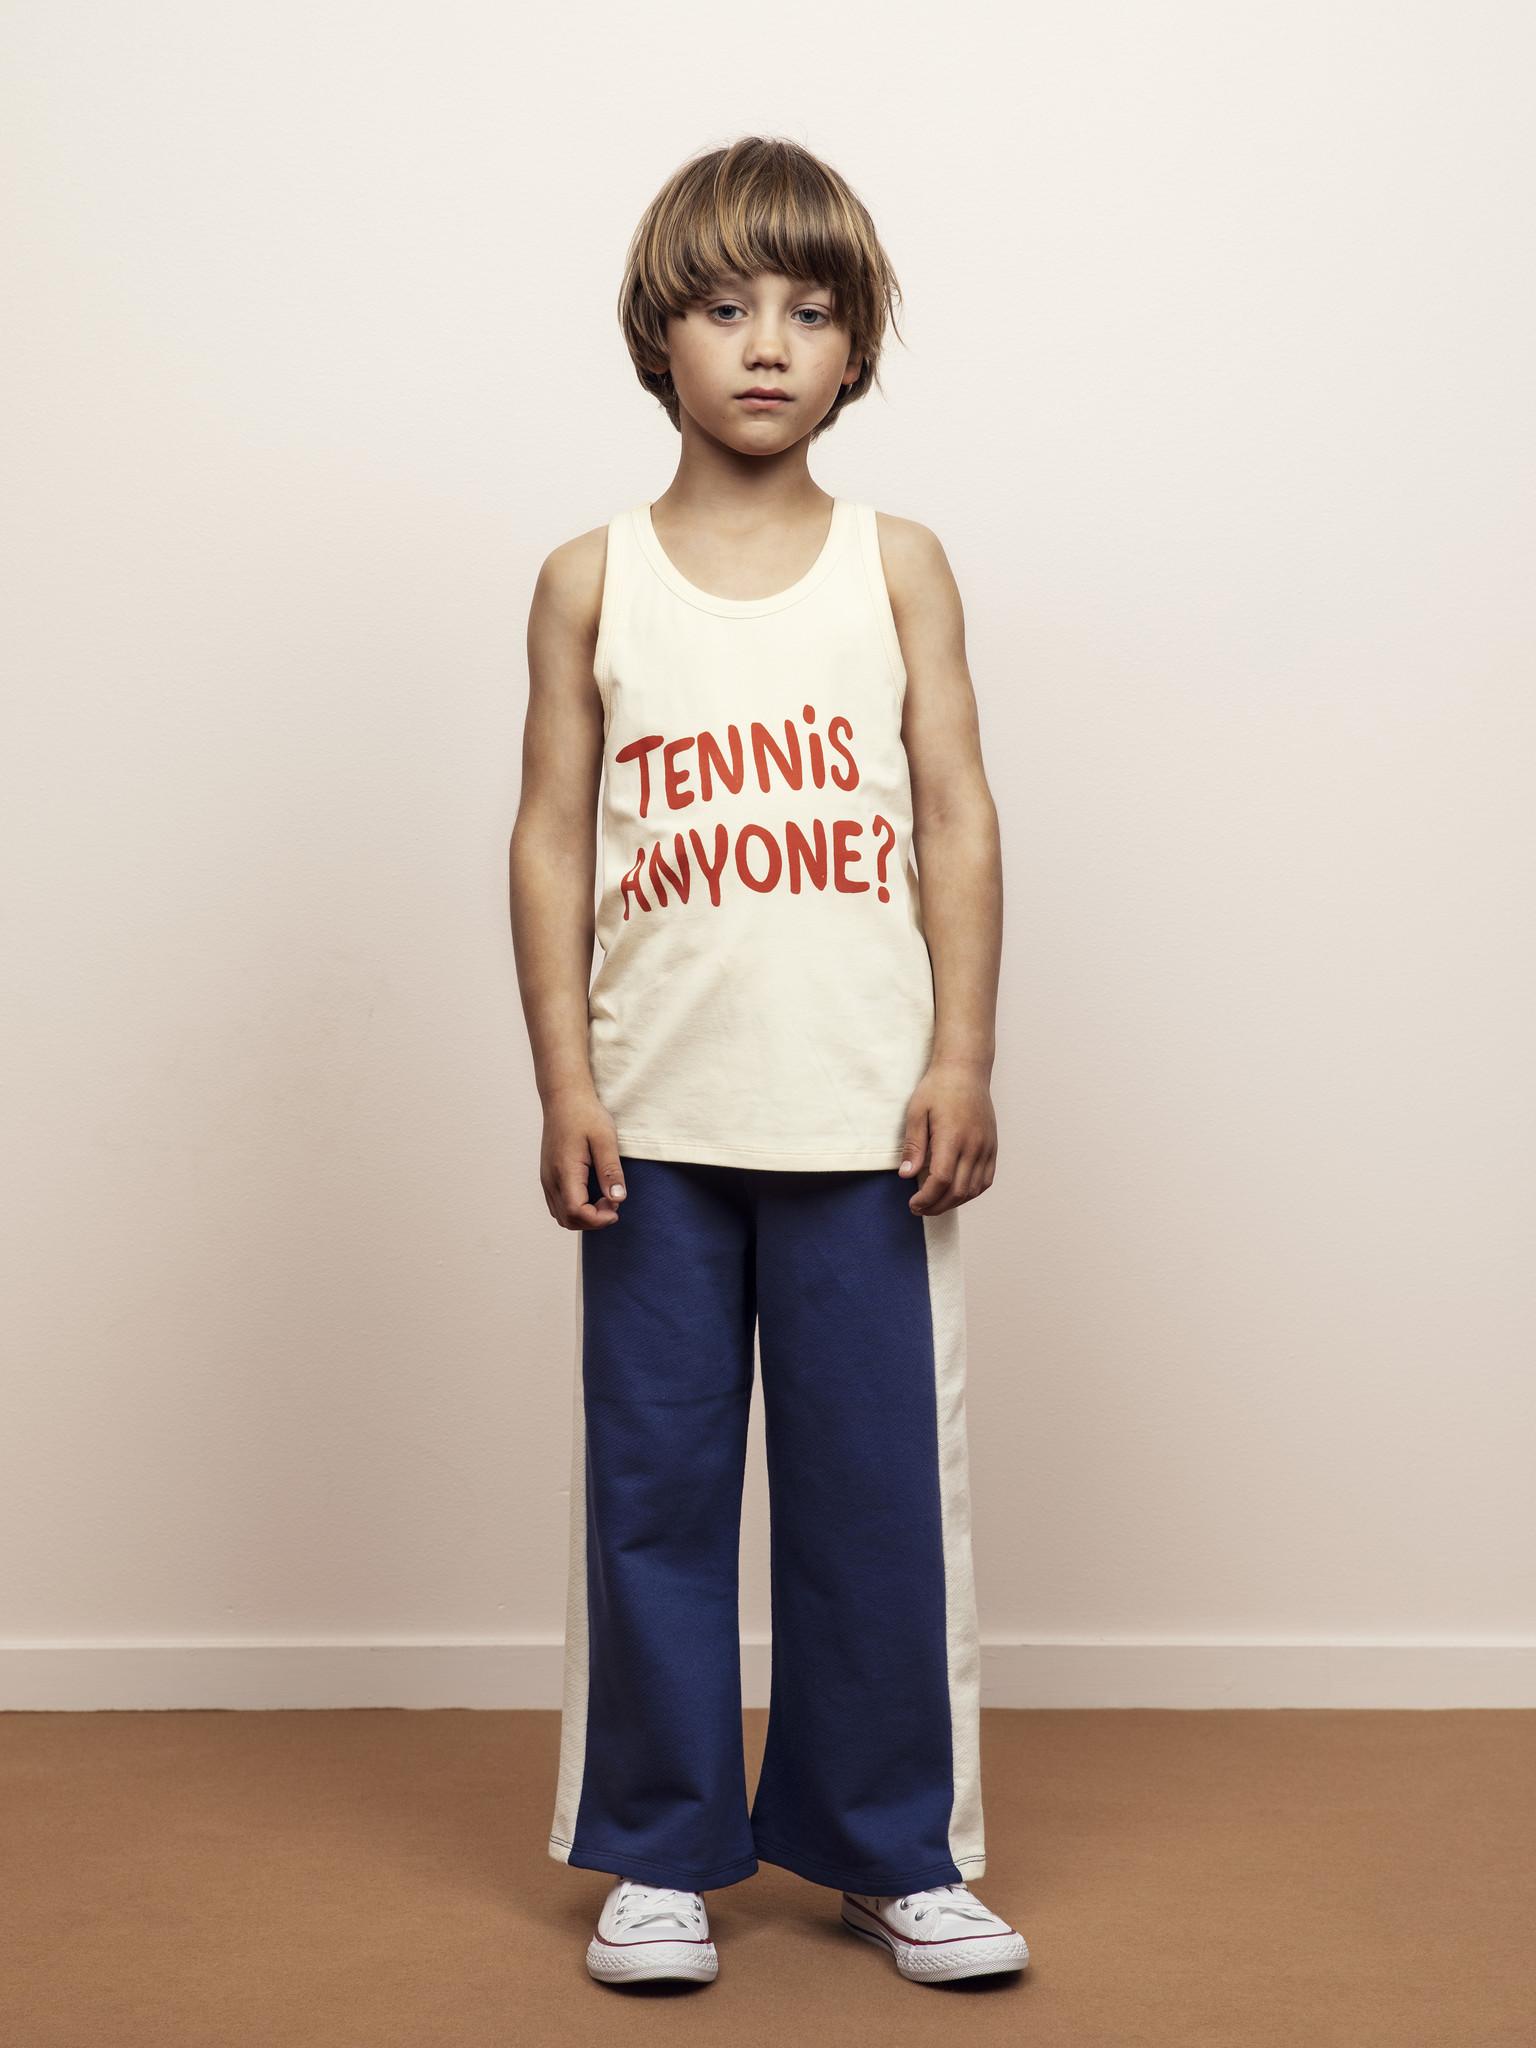 Tennis anyone tank - Offwhite-2